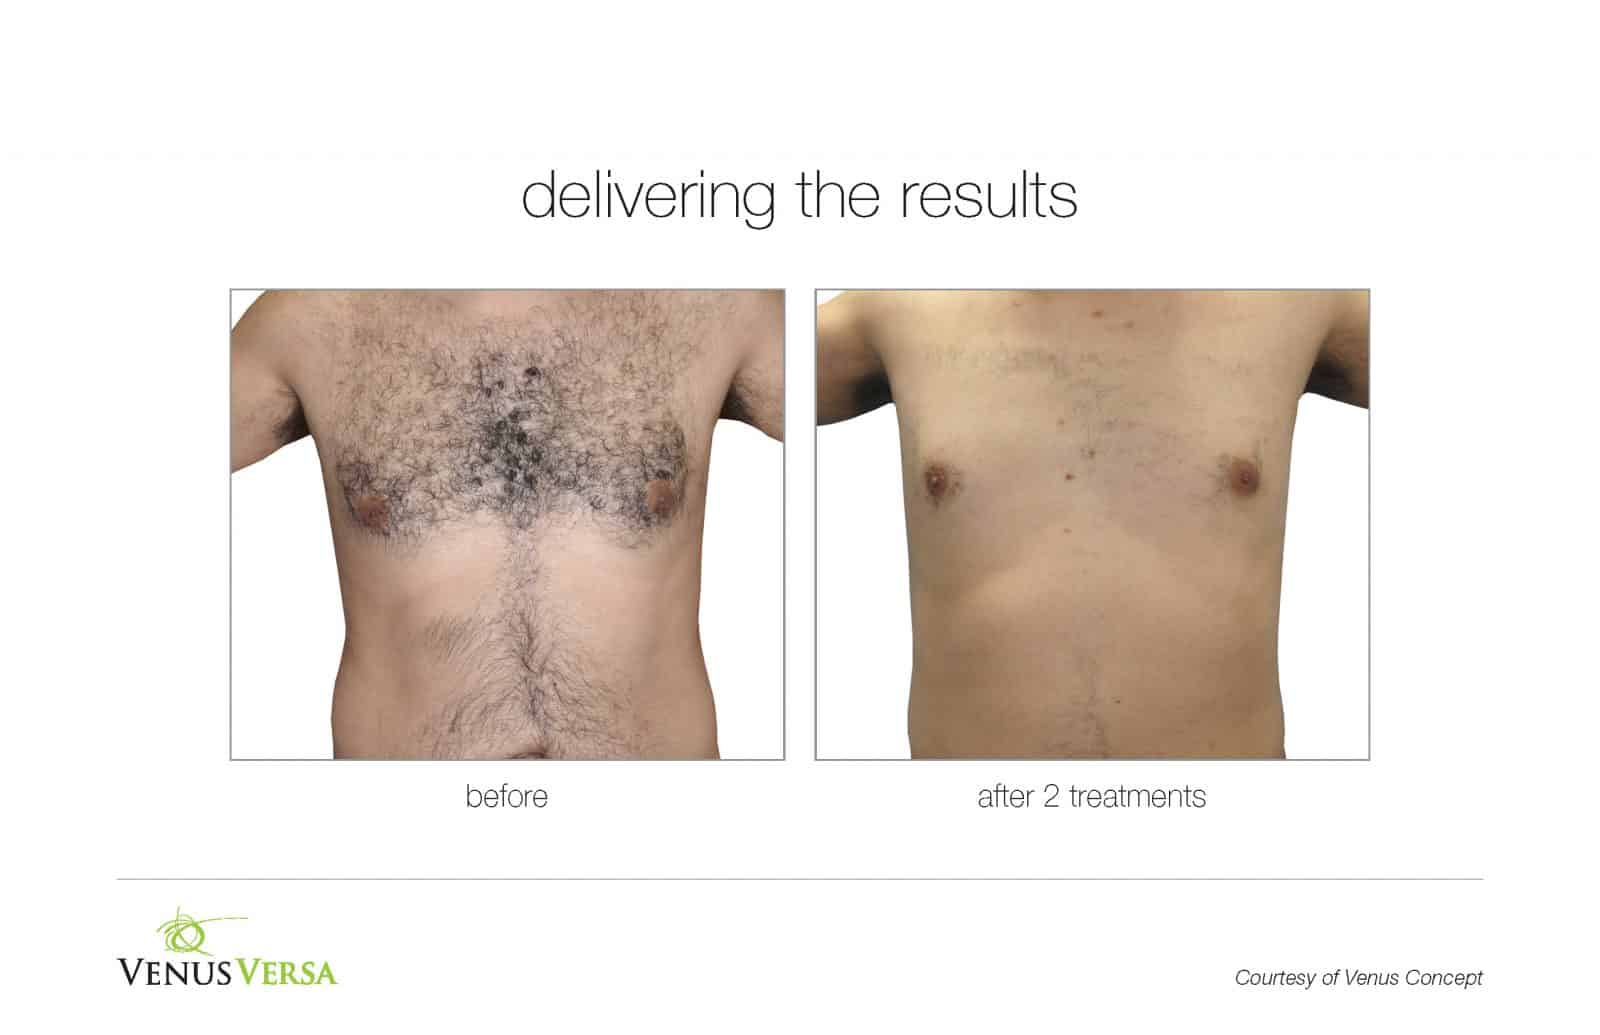 venus versa ba hair removal venus concept